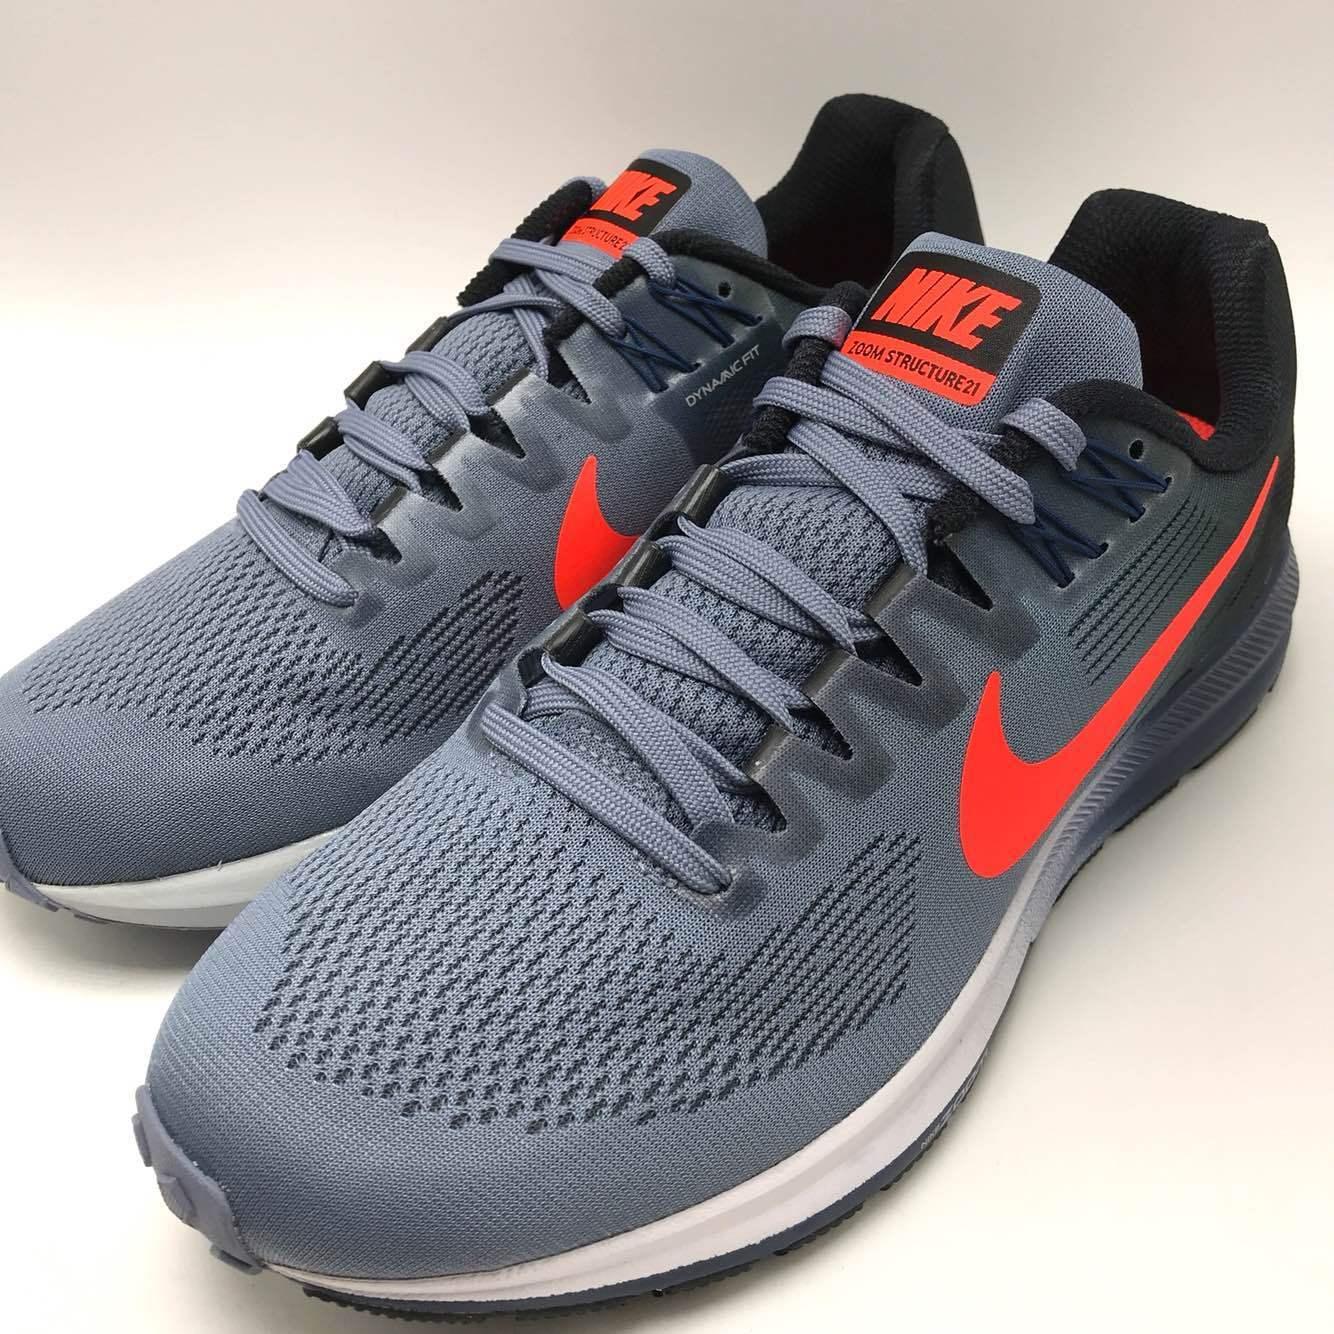 Nike Air Zoom Structure 21 Men's Running Dark Sky Blue/Total Crimson 904695-406 Casual wild